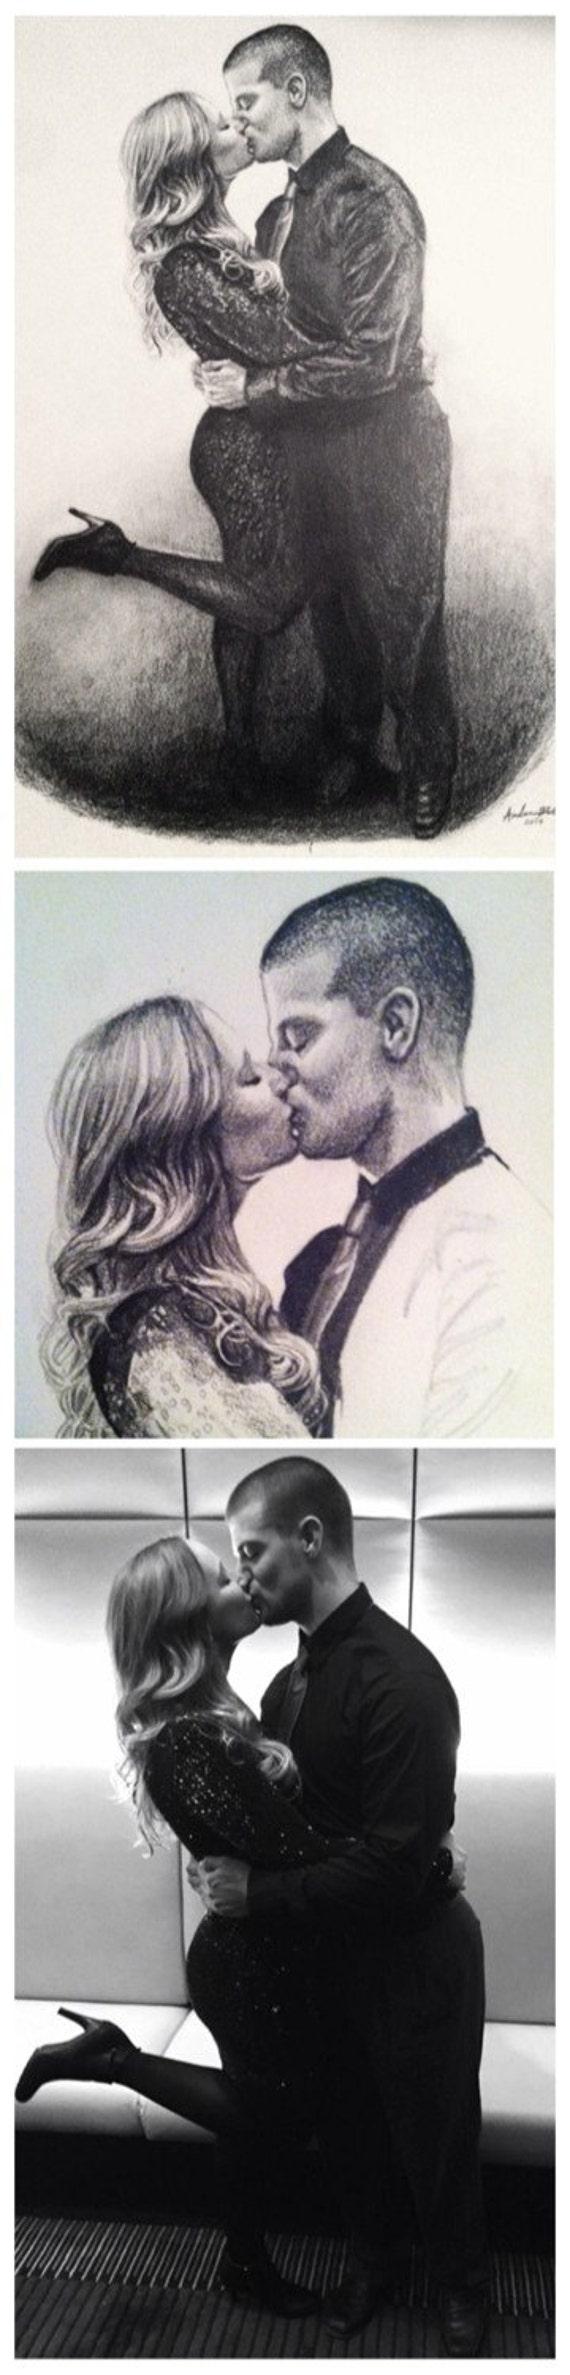 Custom Original Portrait Drawing in Graphite Pencil Realistic Detailed